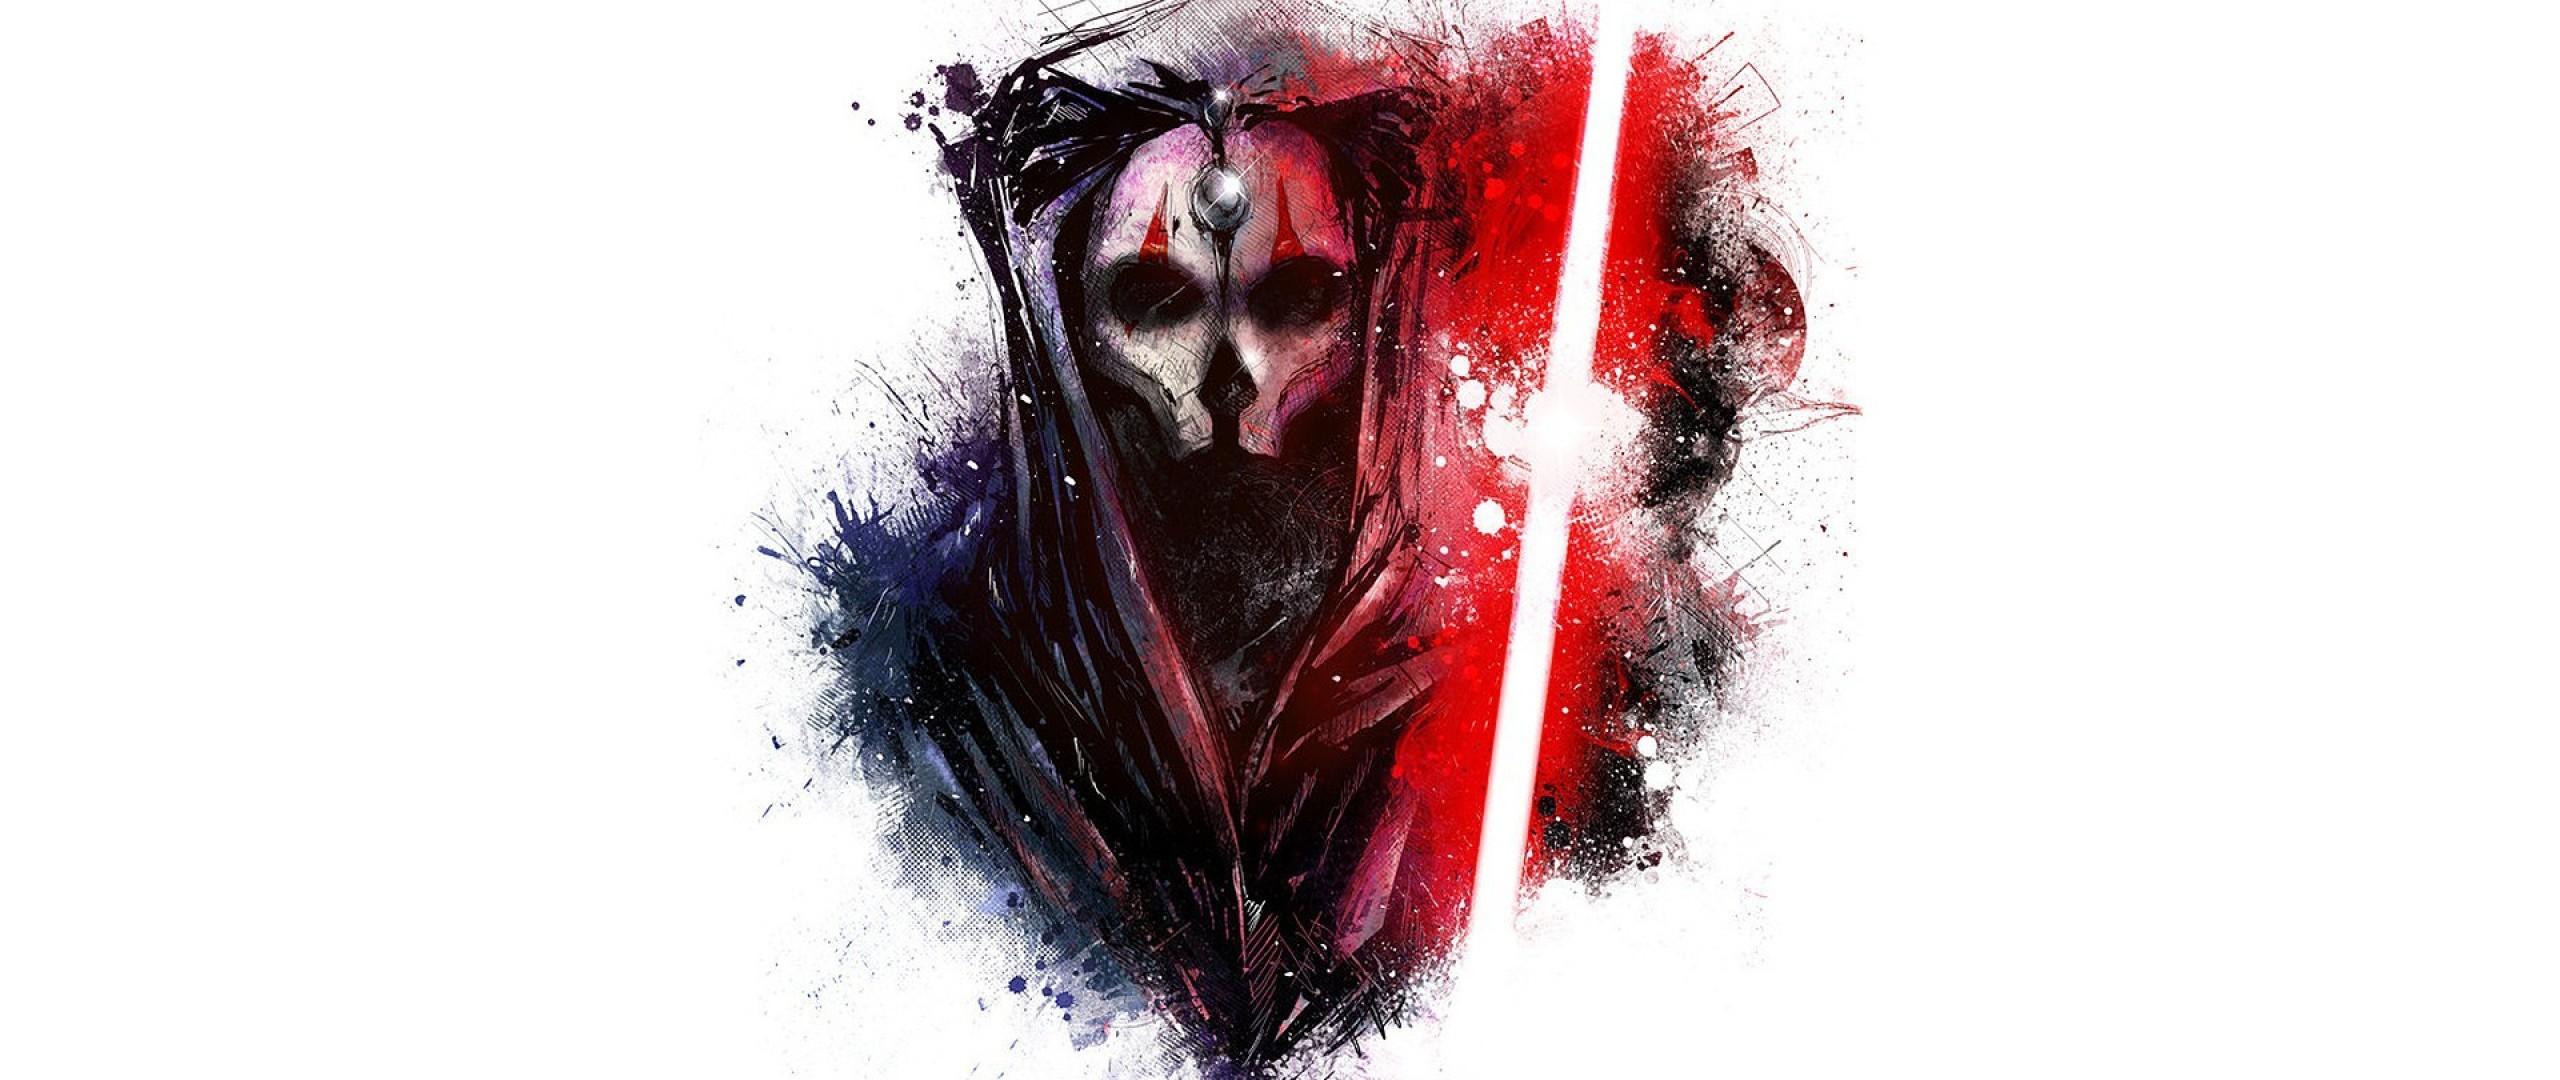 Wallpaper star wars, art, sword, mask